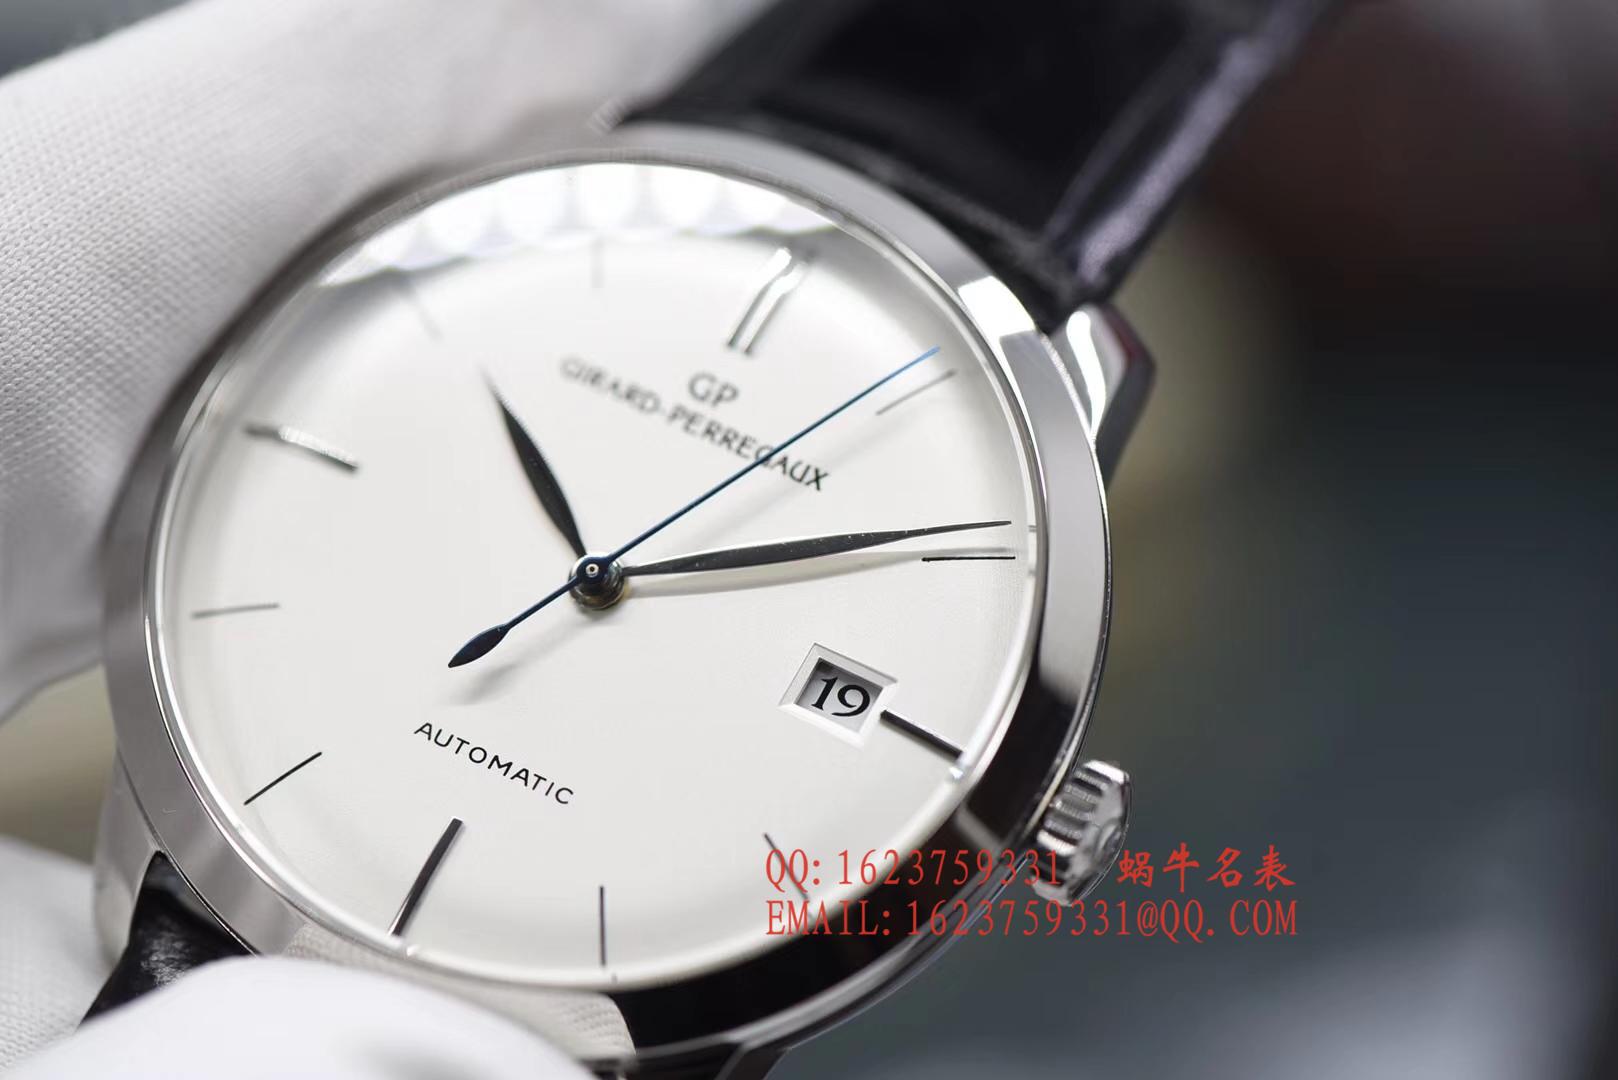 【FK一比一超A精仿手表】芝柏1966系列49525-52-131-BK6A腕表